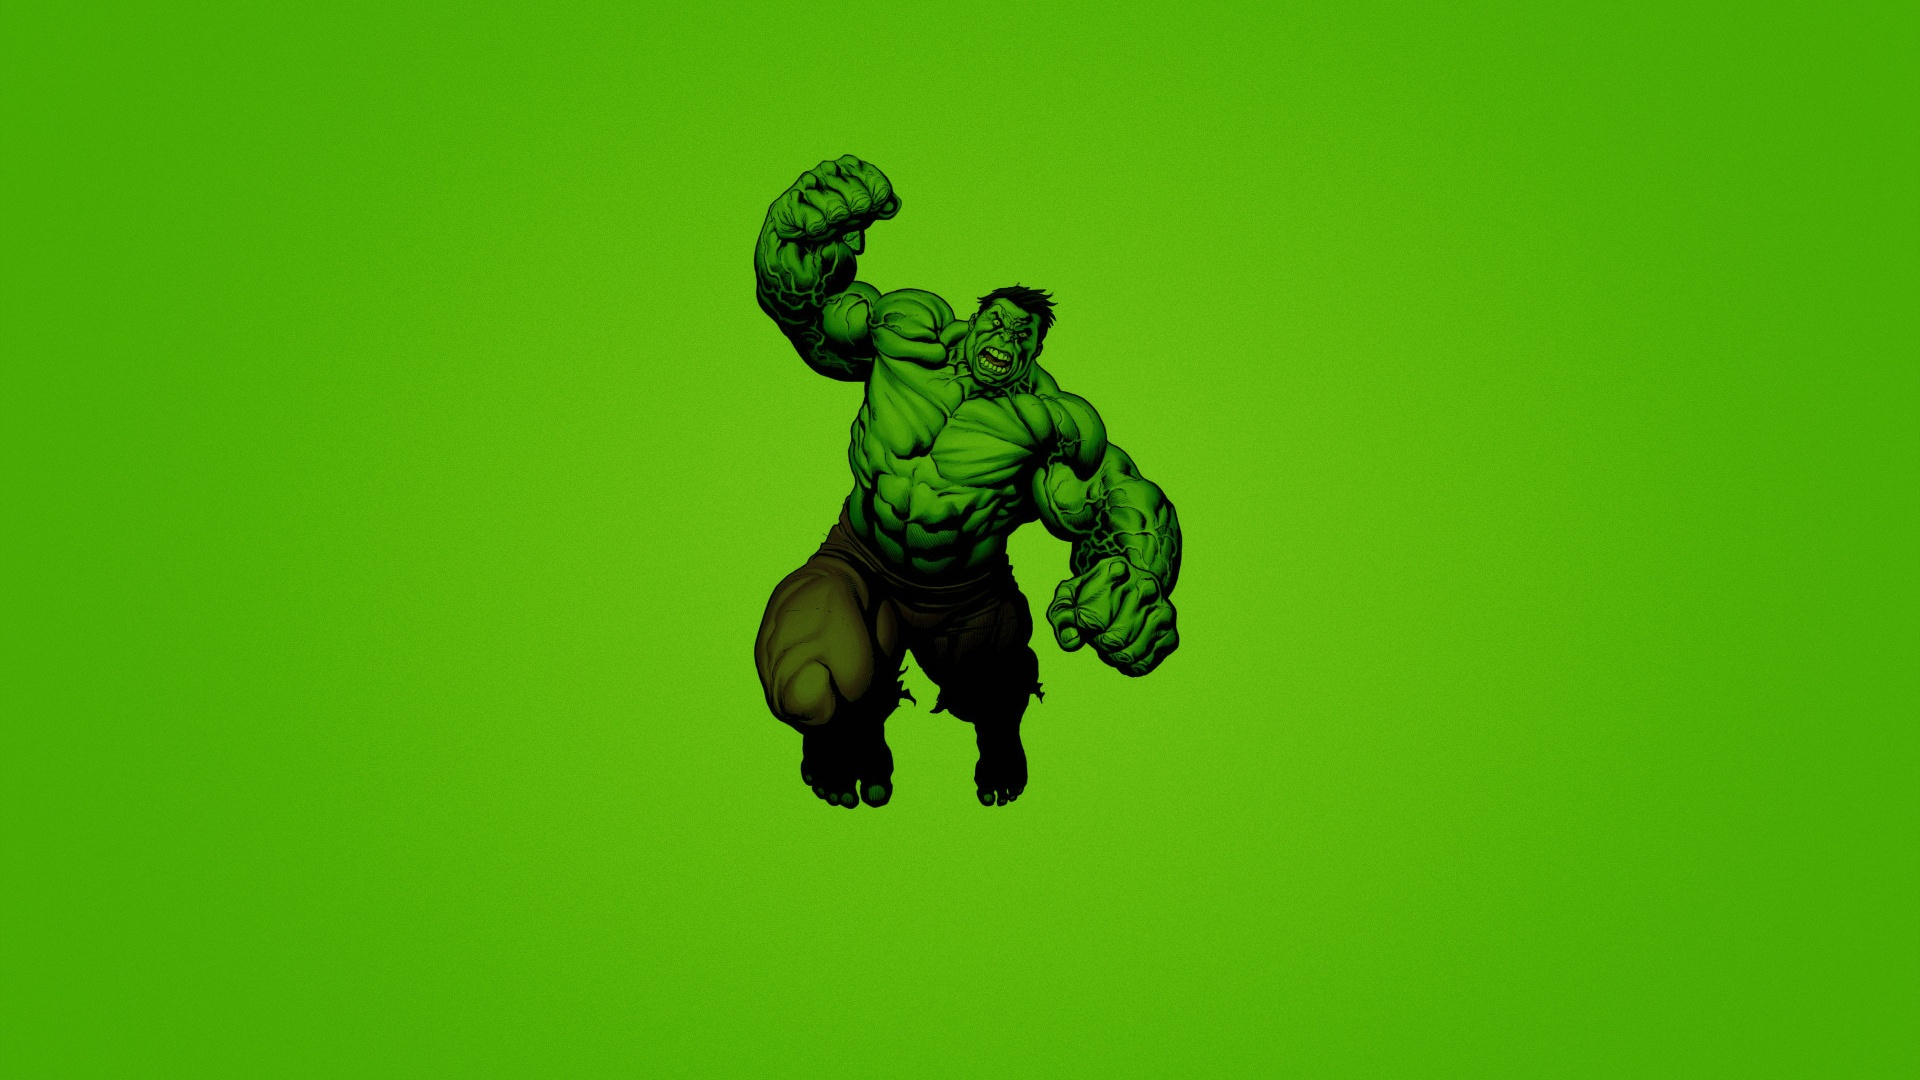 Hulk background picture